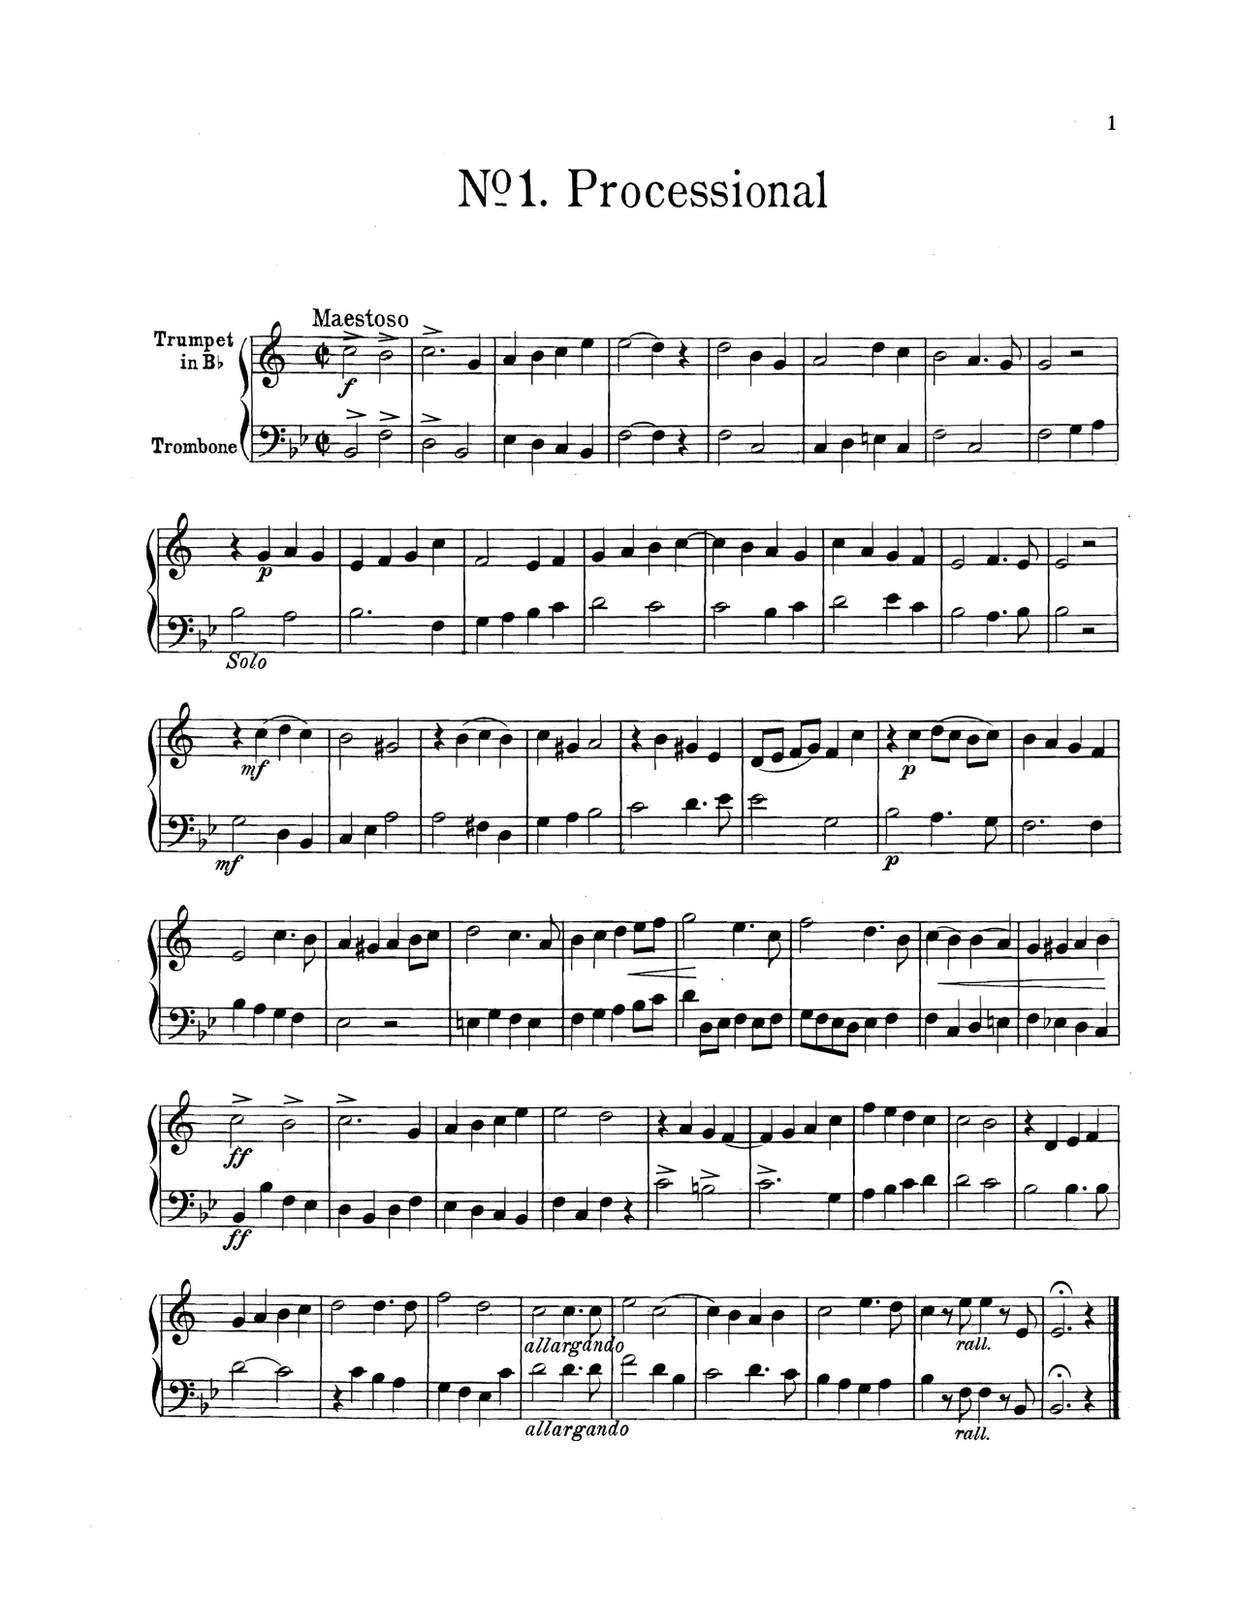 Shuebruk, 20 Duets Trumpet a pdf 2